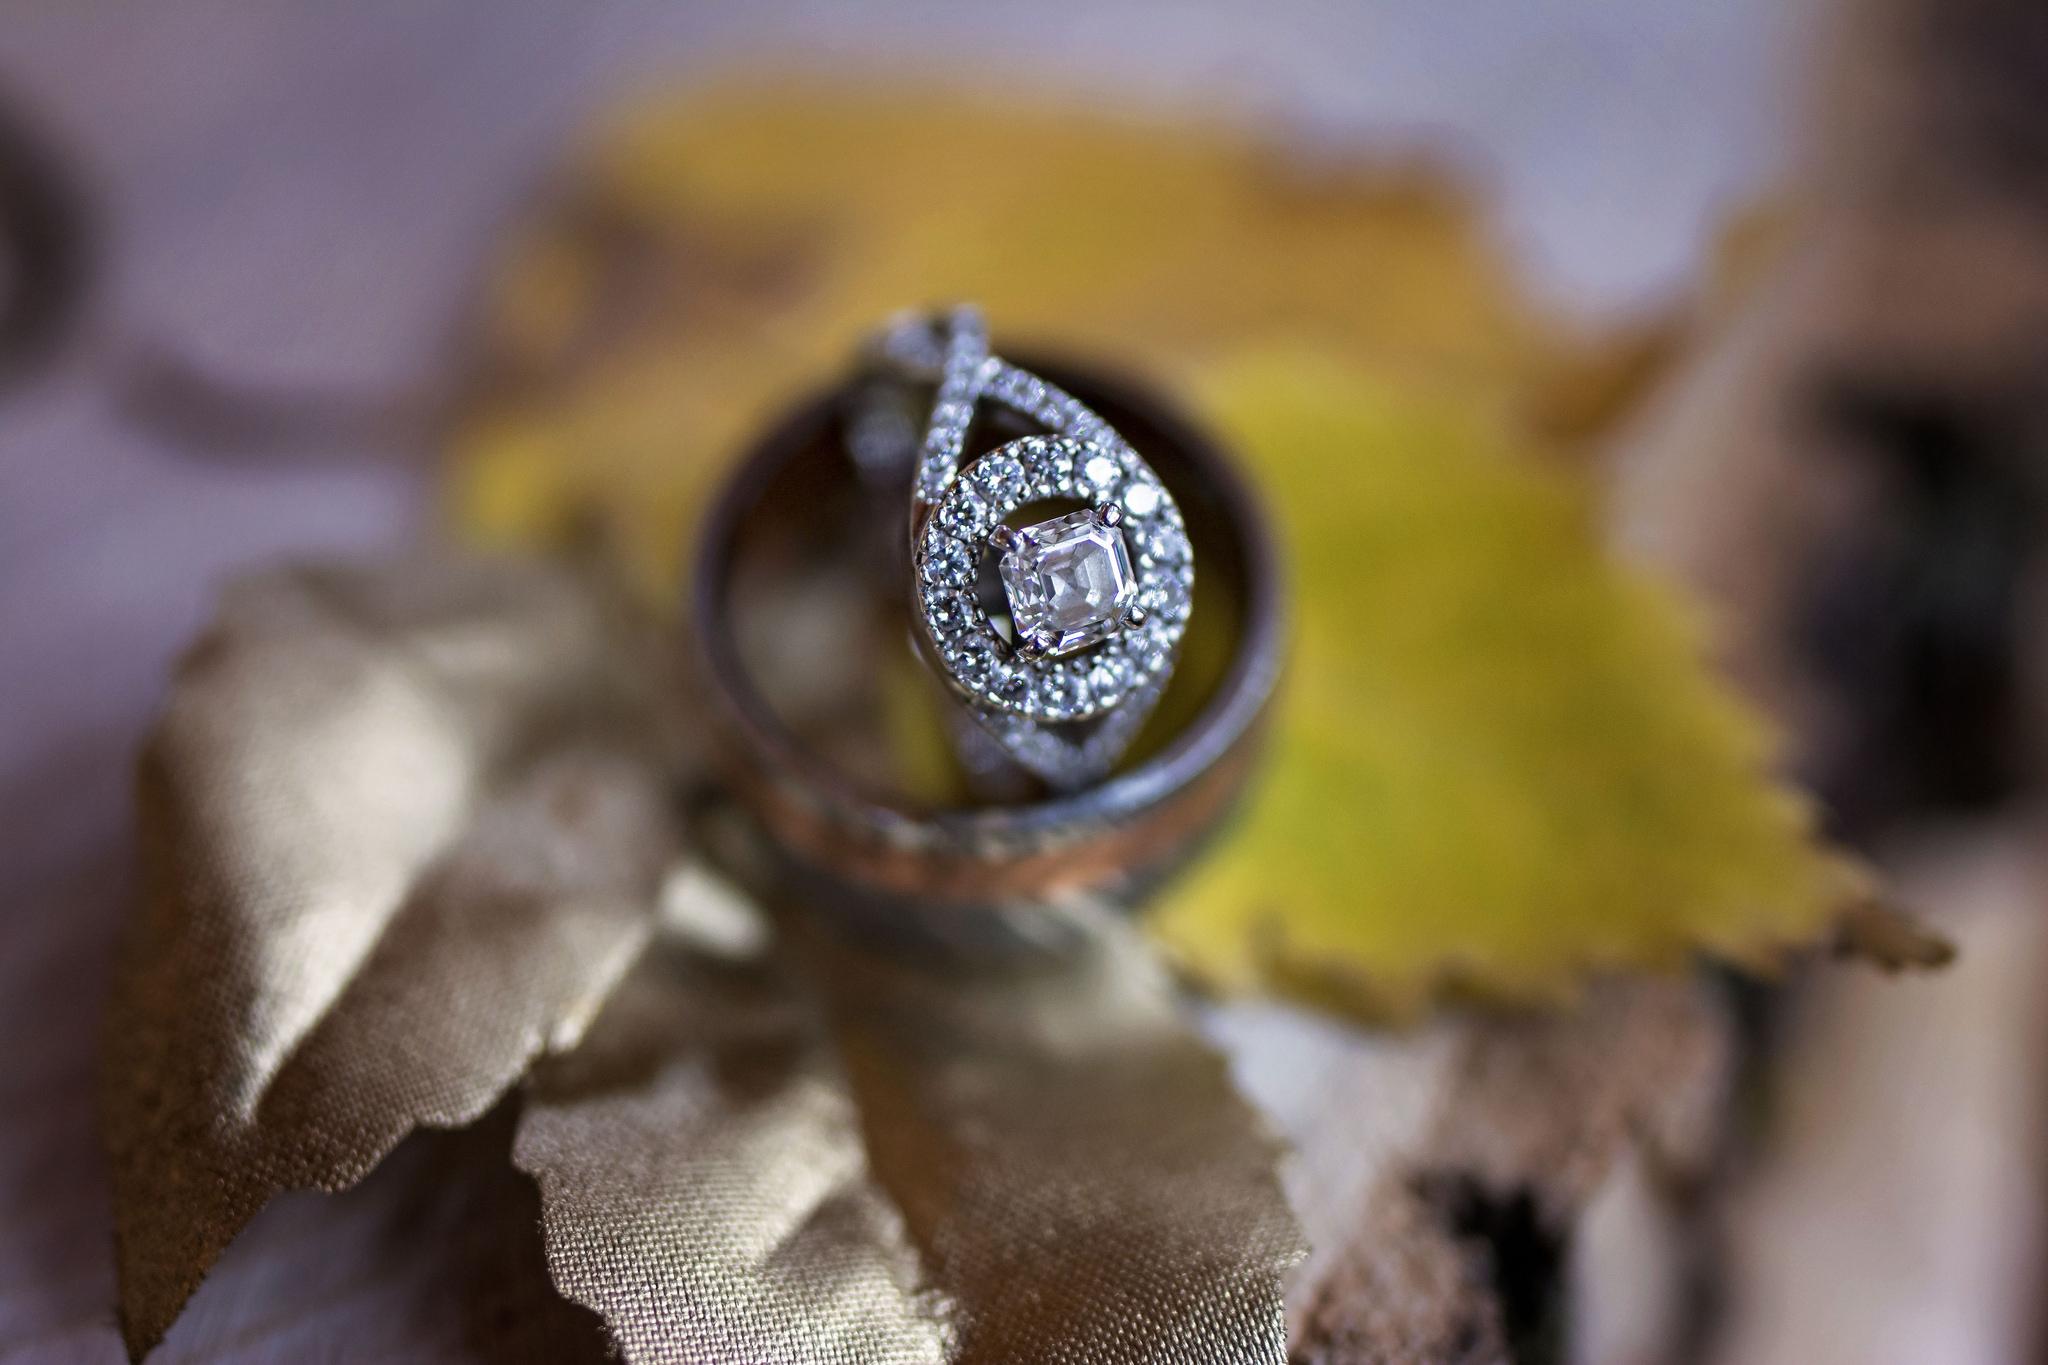 kristine_wedding_rings_spiritedtable_photo05.jpg